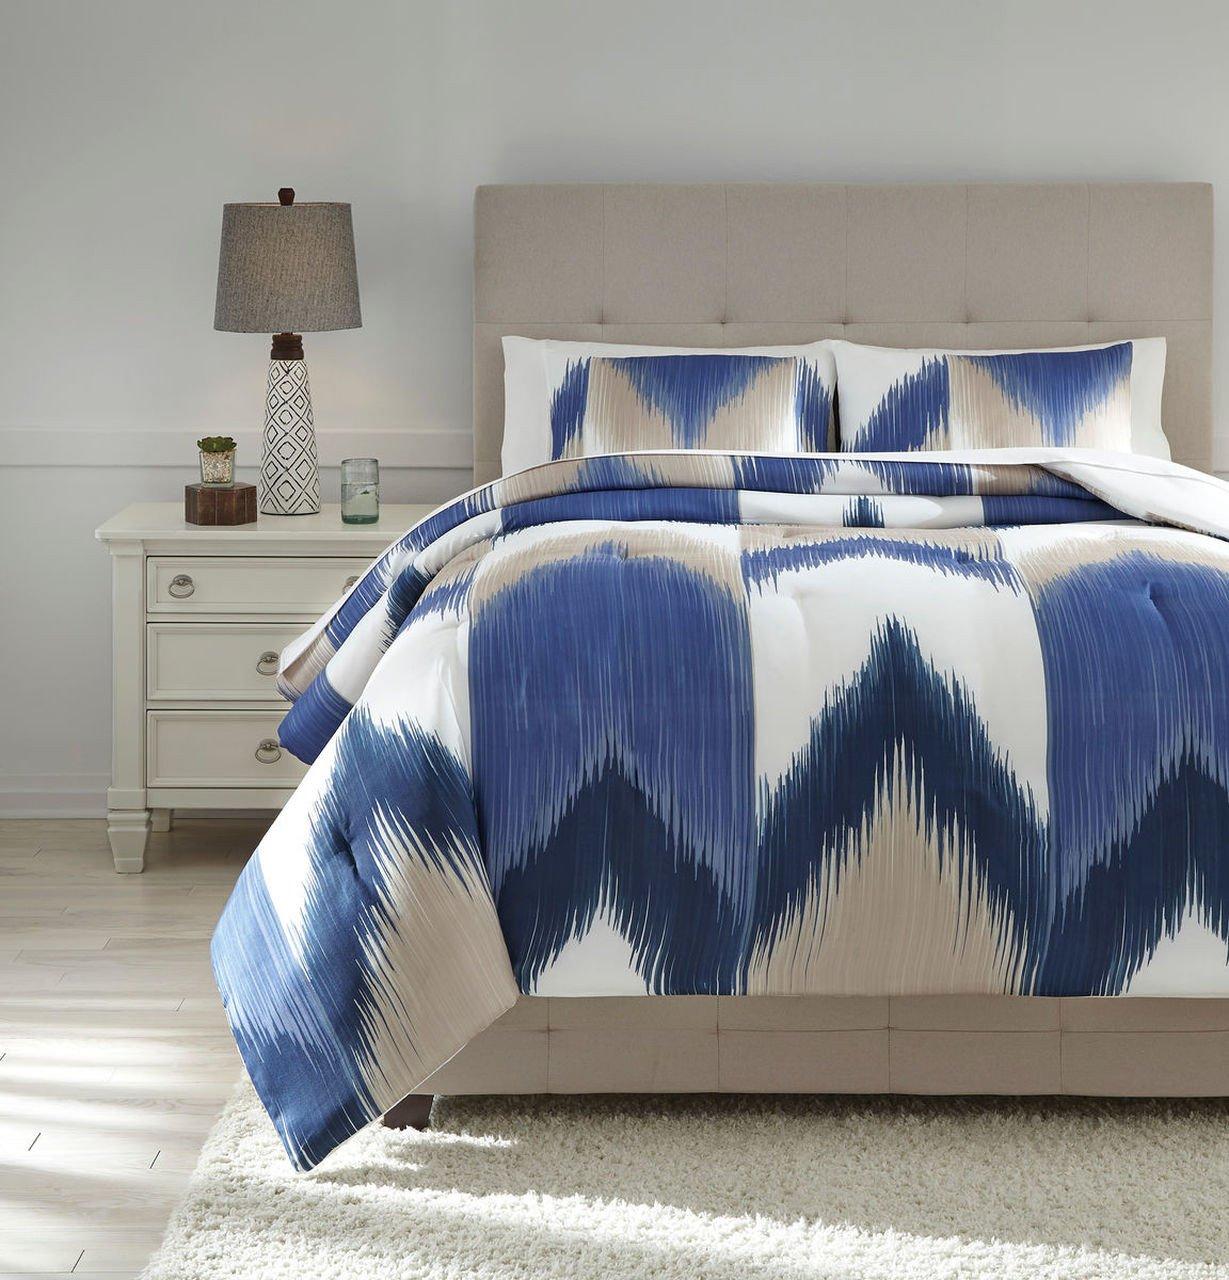 Cheap Bedroom Comforter Set Elegant Mayda Blue F White King forter Set